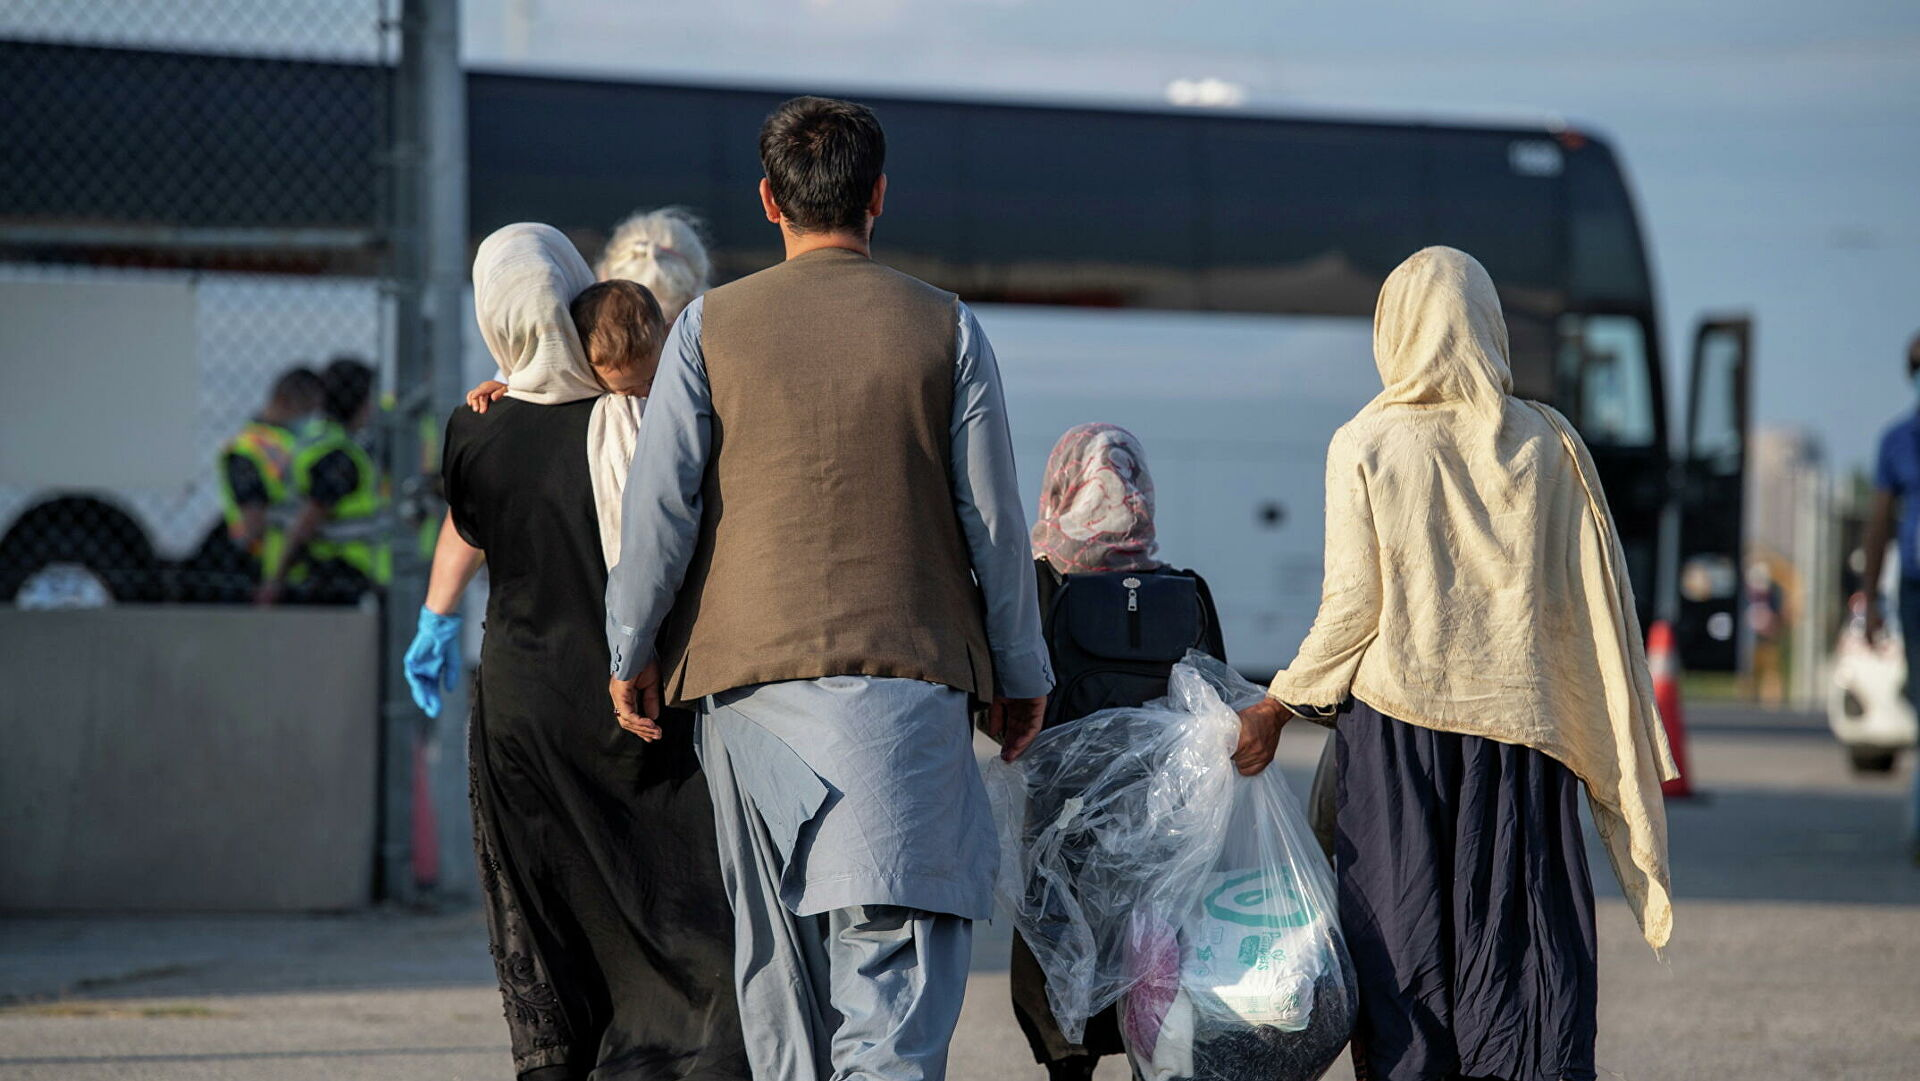 Европа в ожидании наплыва беженцев из Афганистана